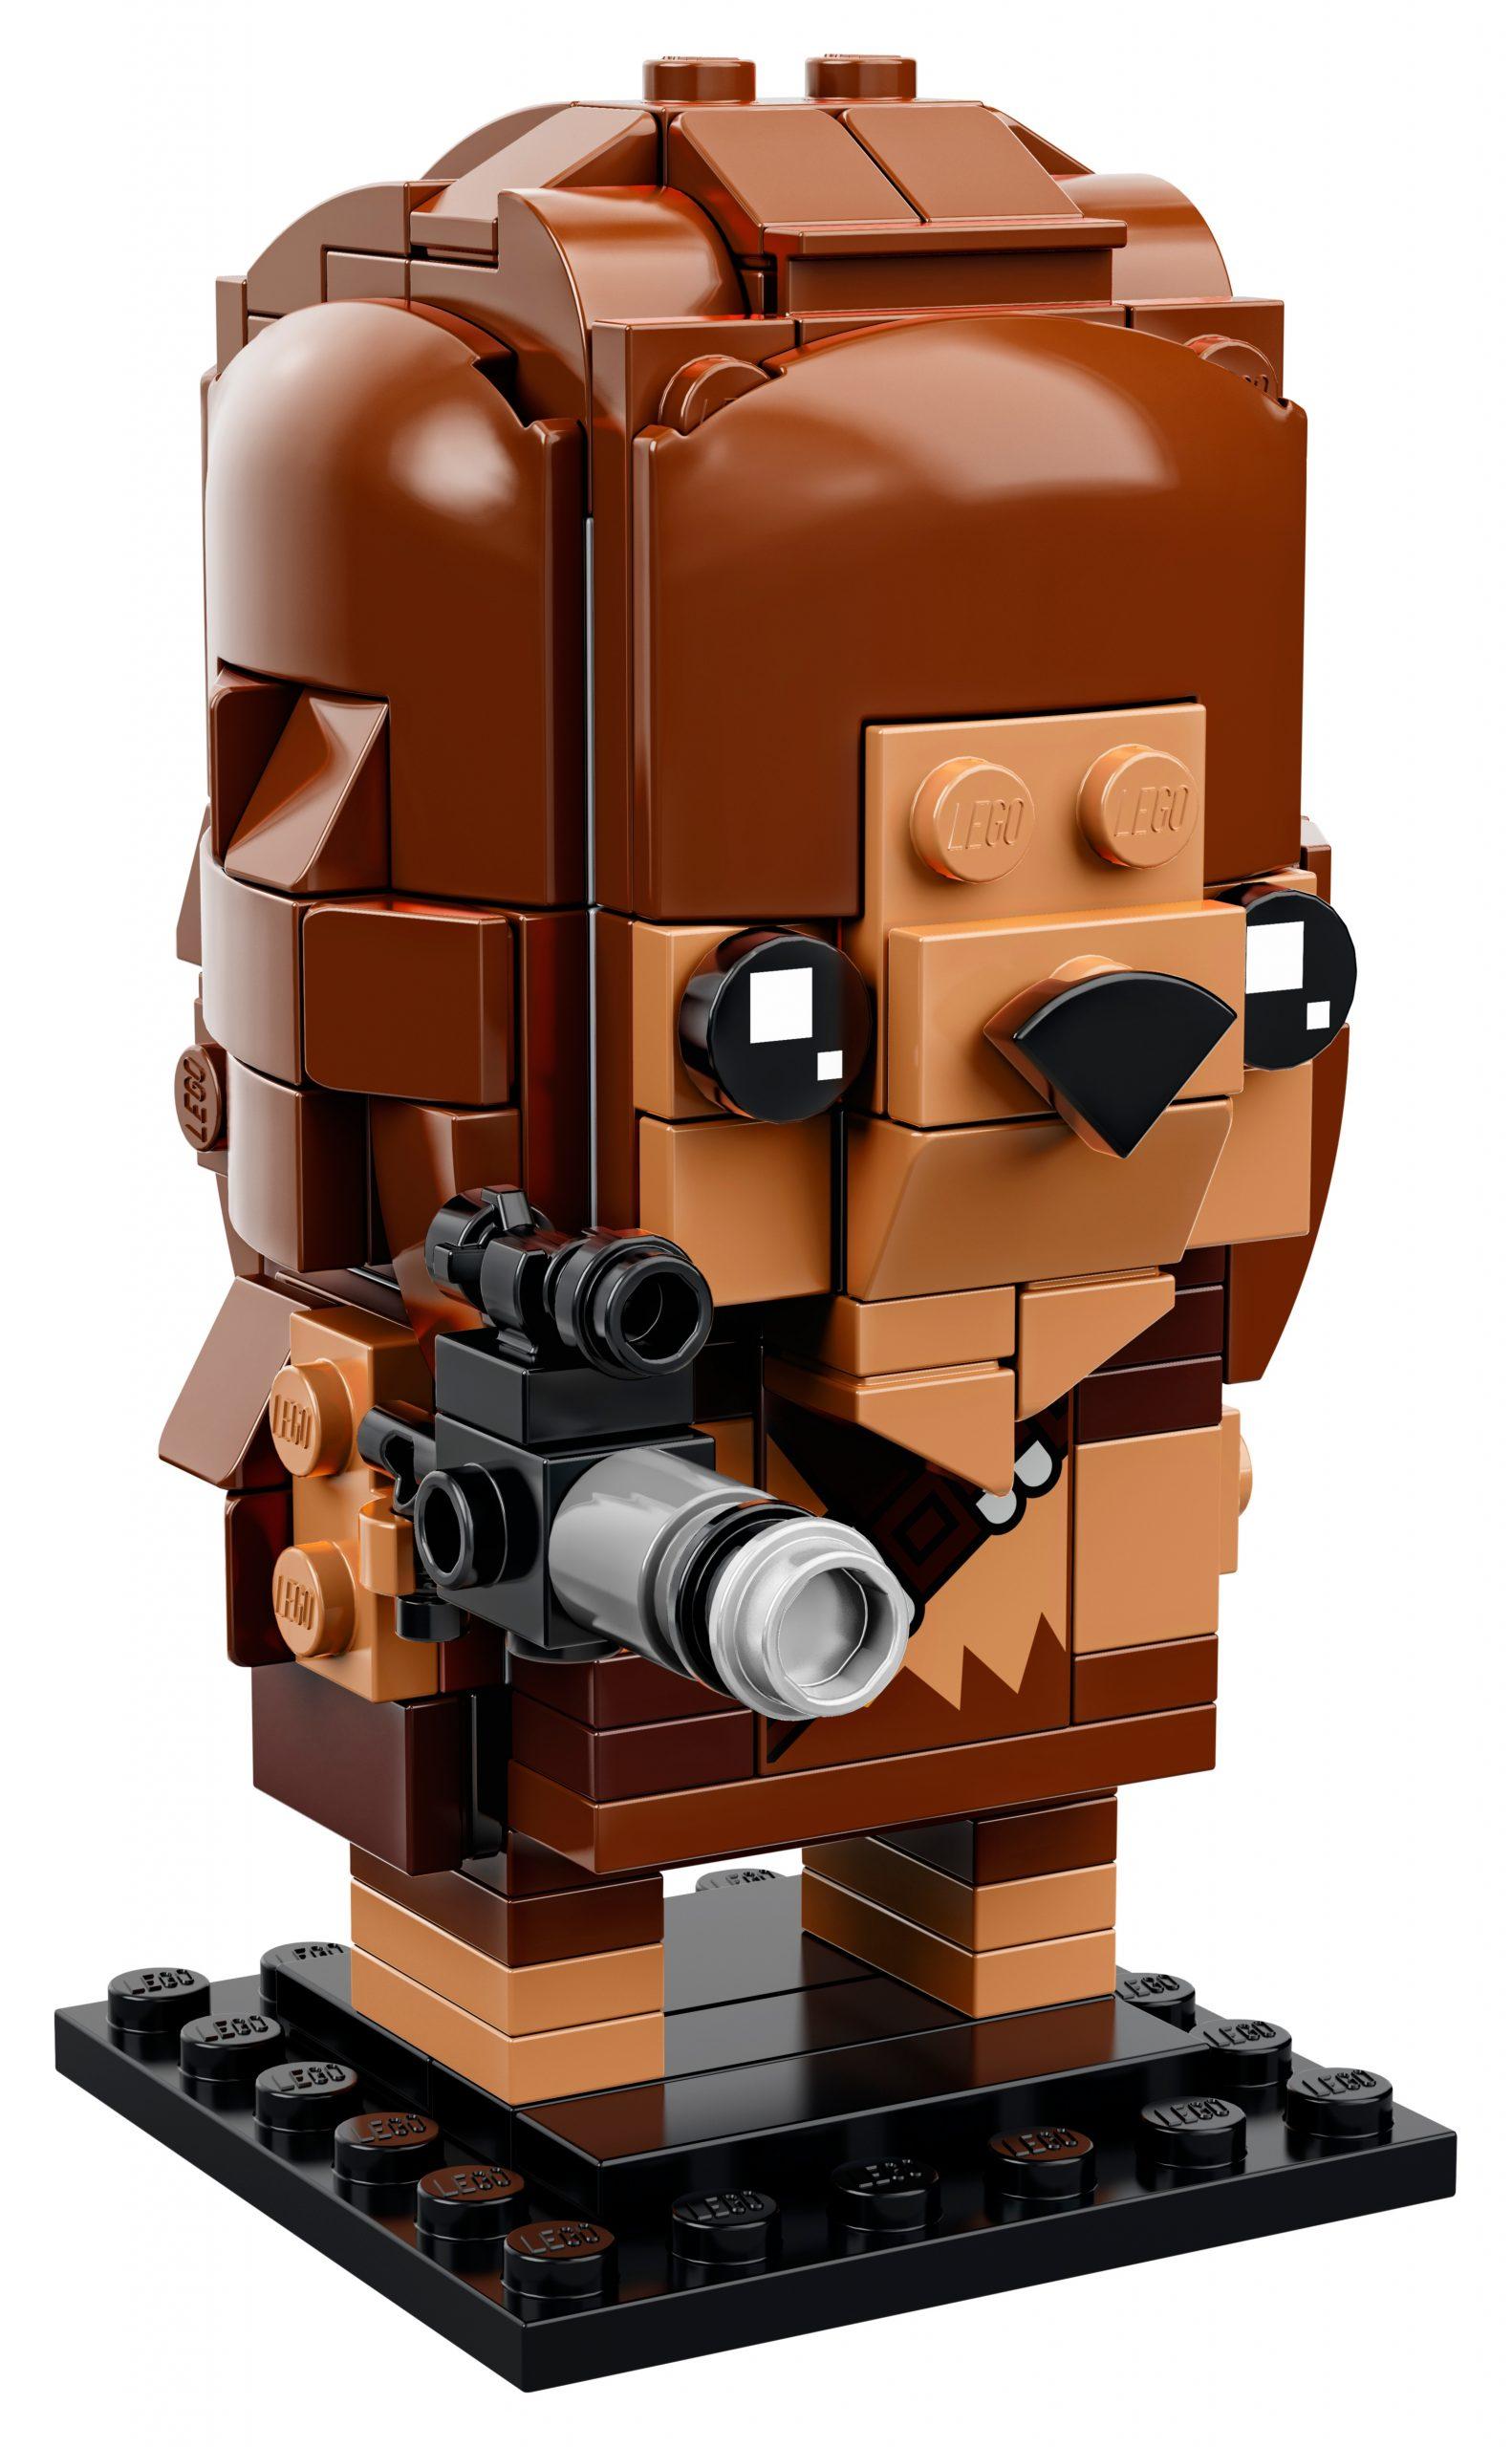 lego chewbacca 41609 scaled